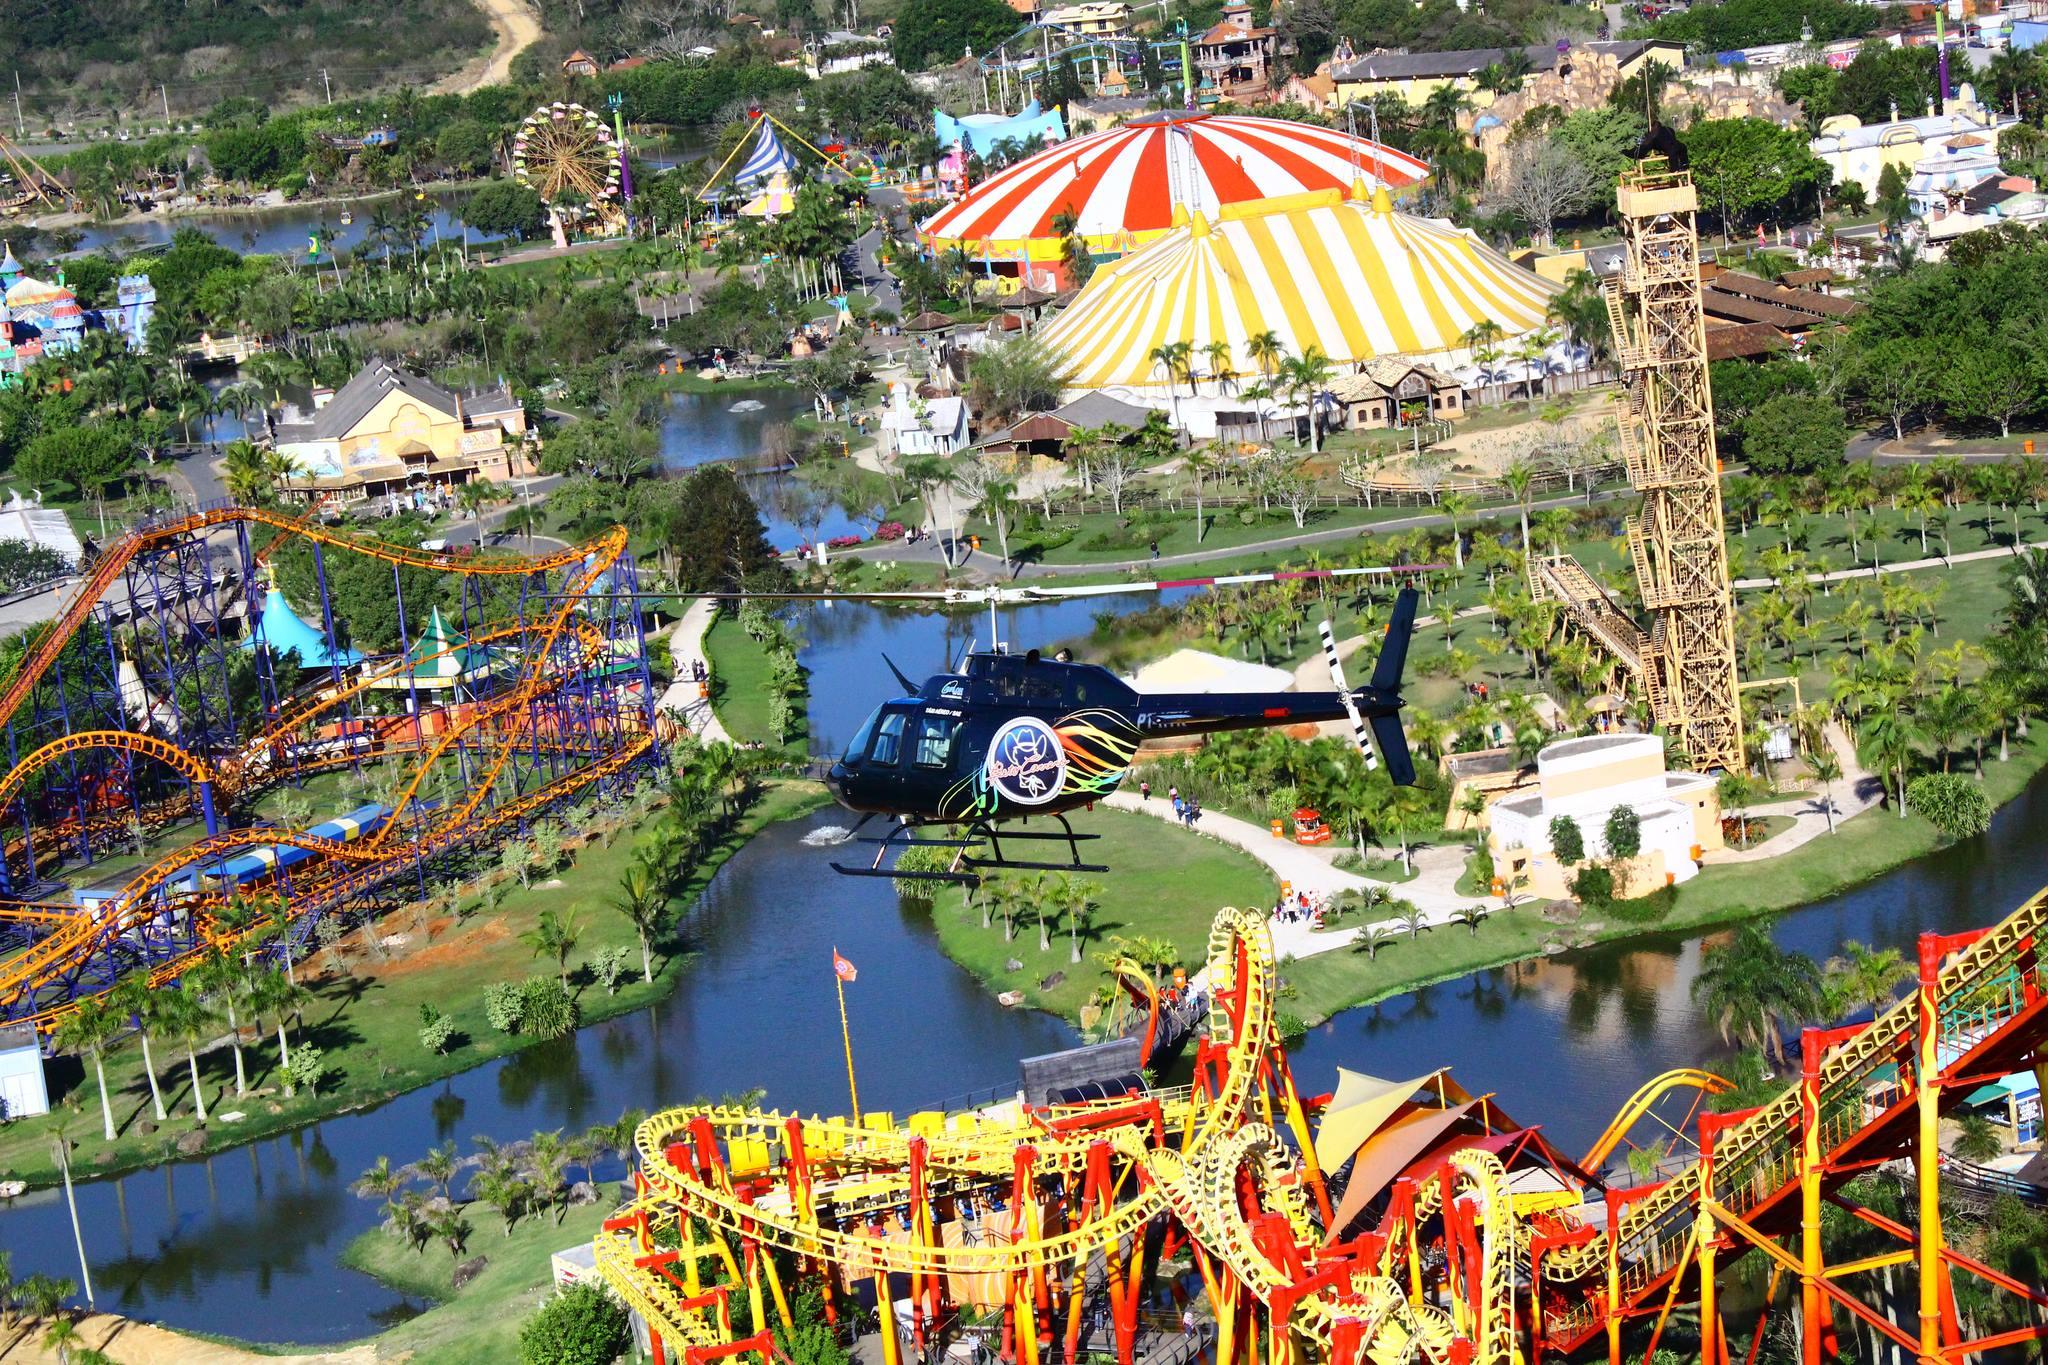 Vôo Helicóptero Beto Carrero World